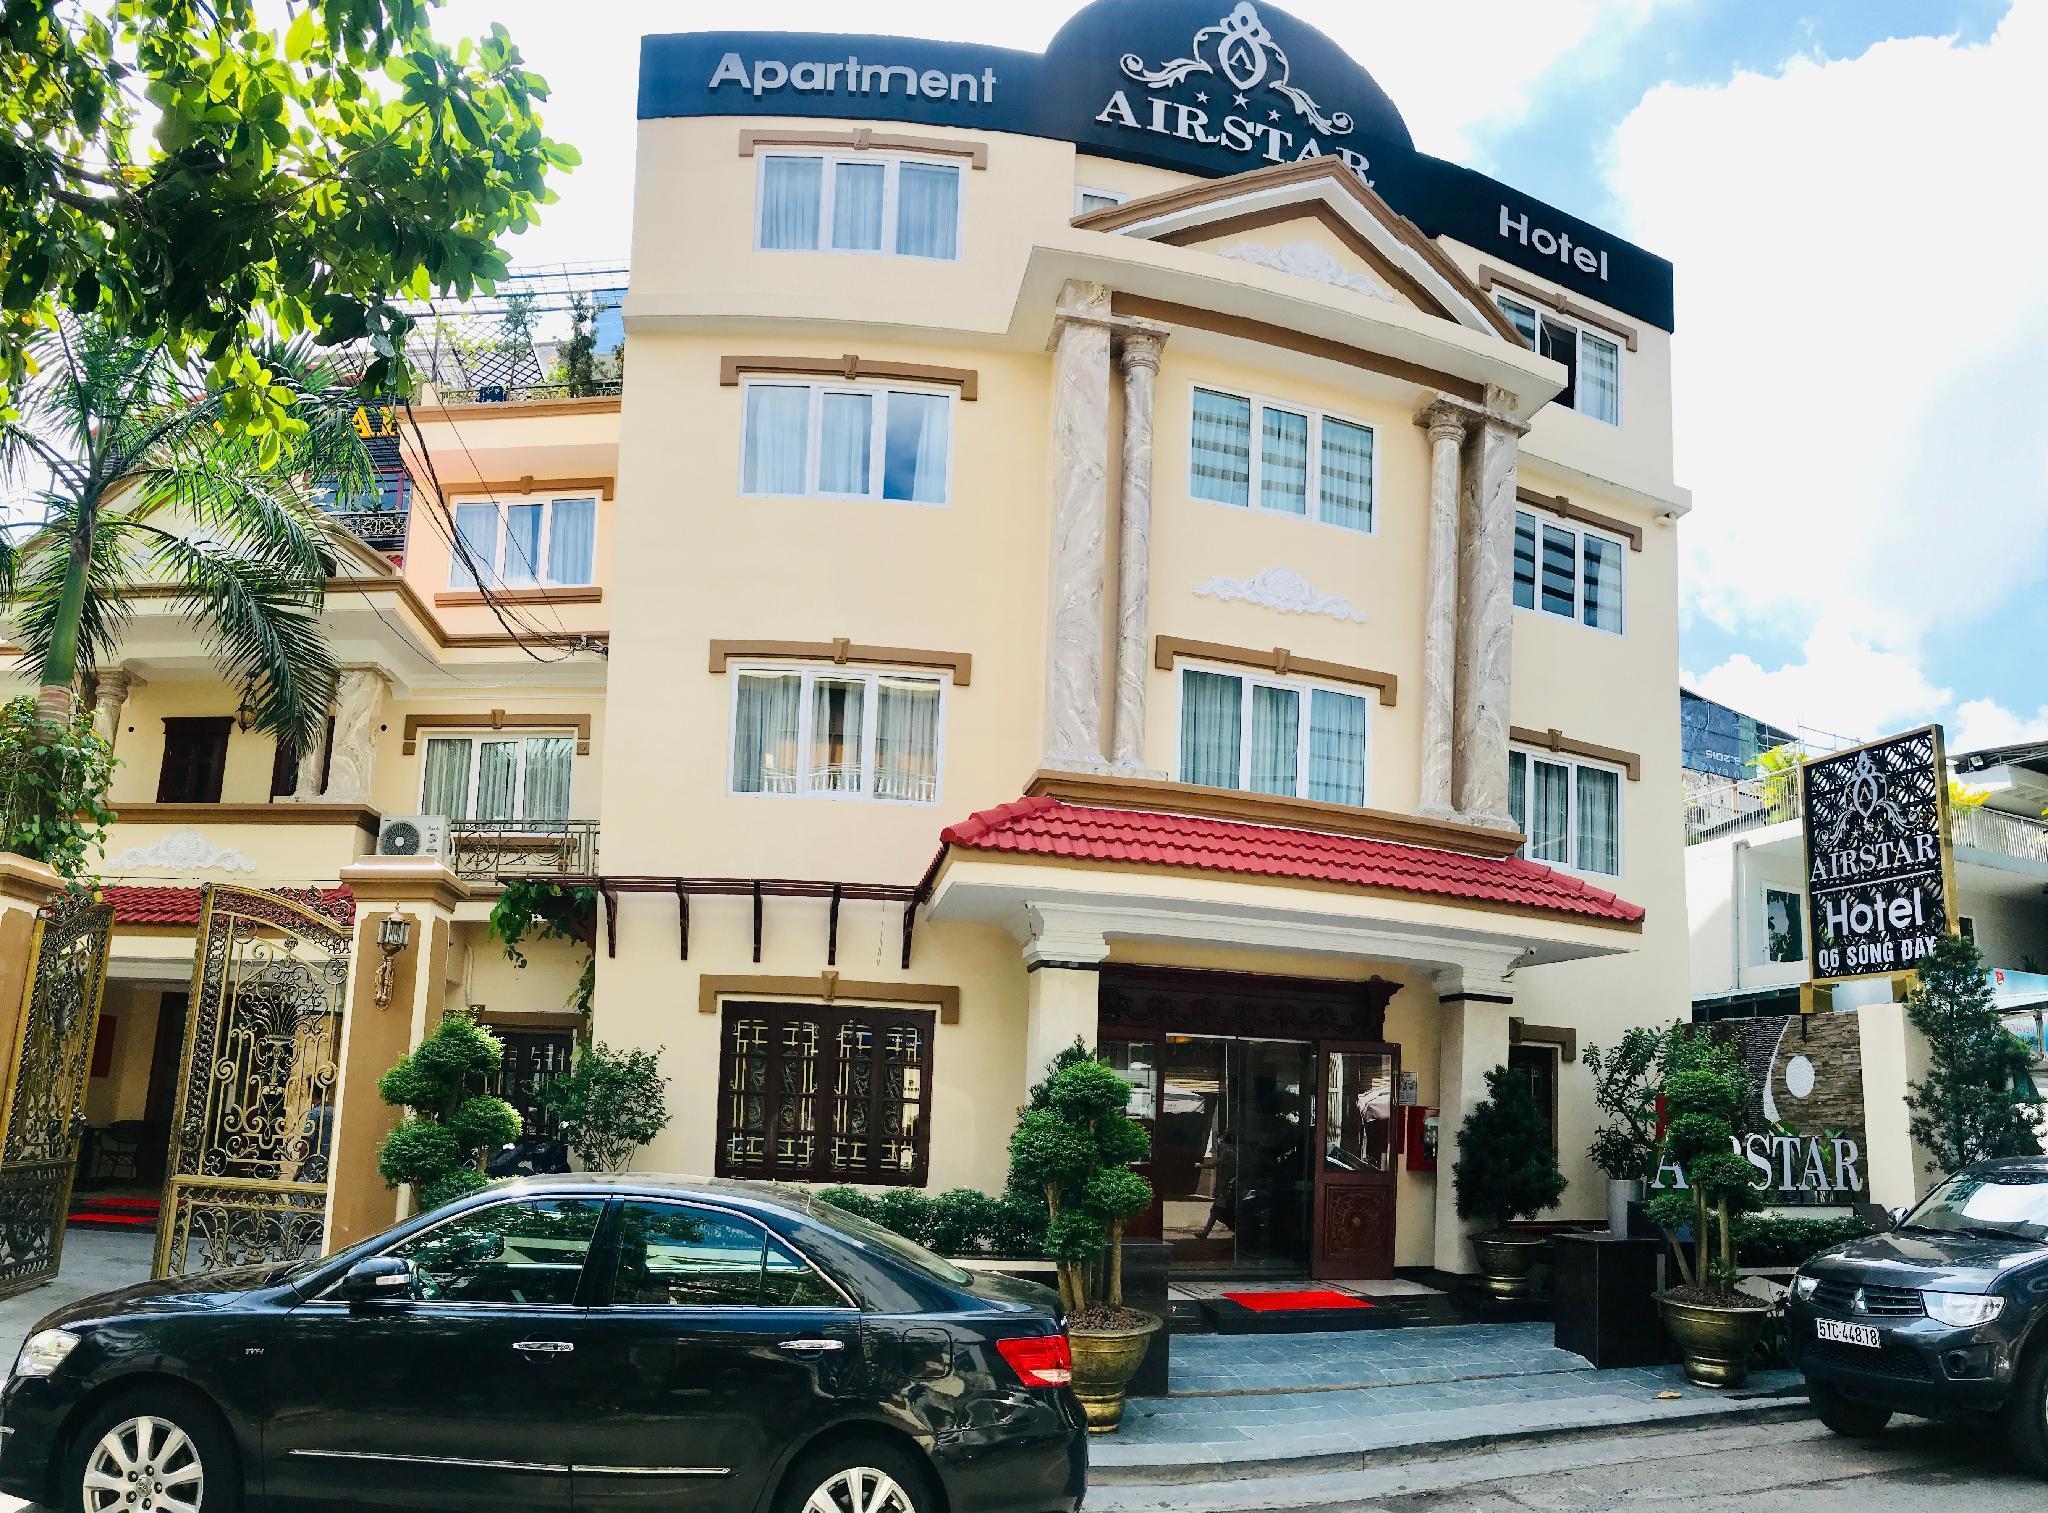 Airstar Hotel & Apartments